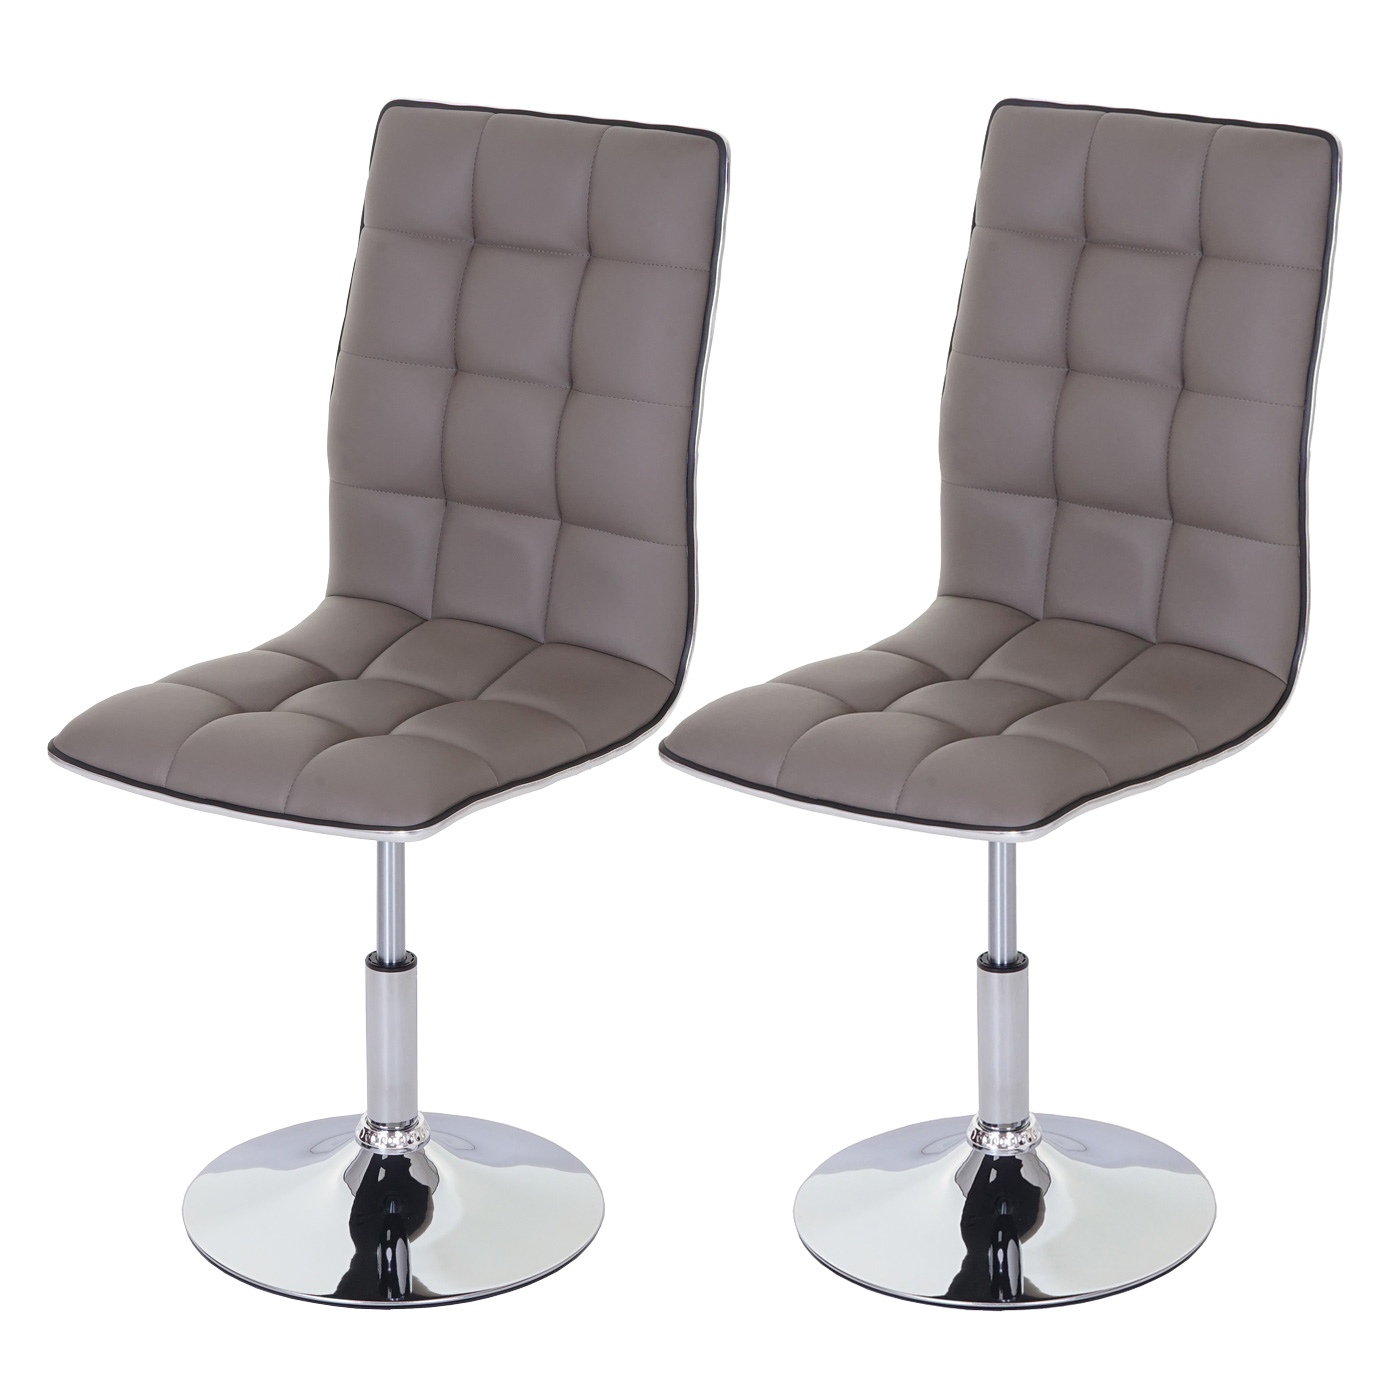 2x esszimmerstuhl hwc c41 stuhl lehnstuhl h henverstellbar drehbar kunstleder taupe